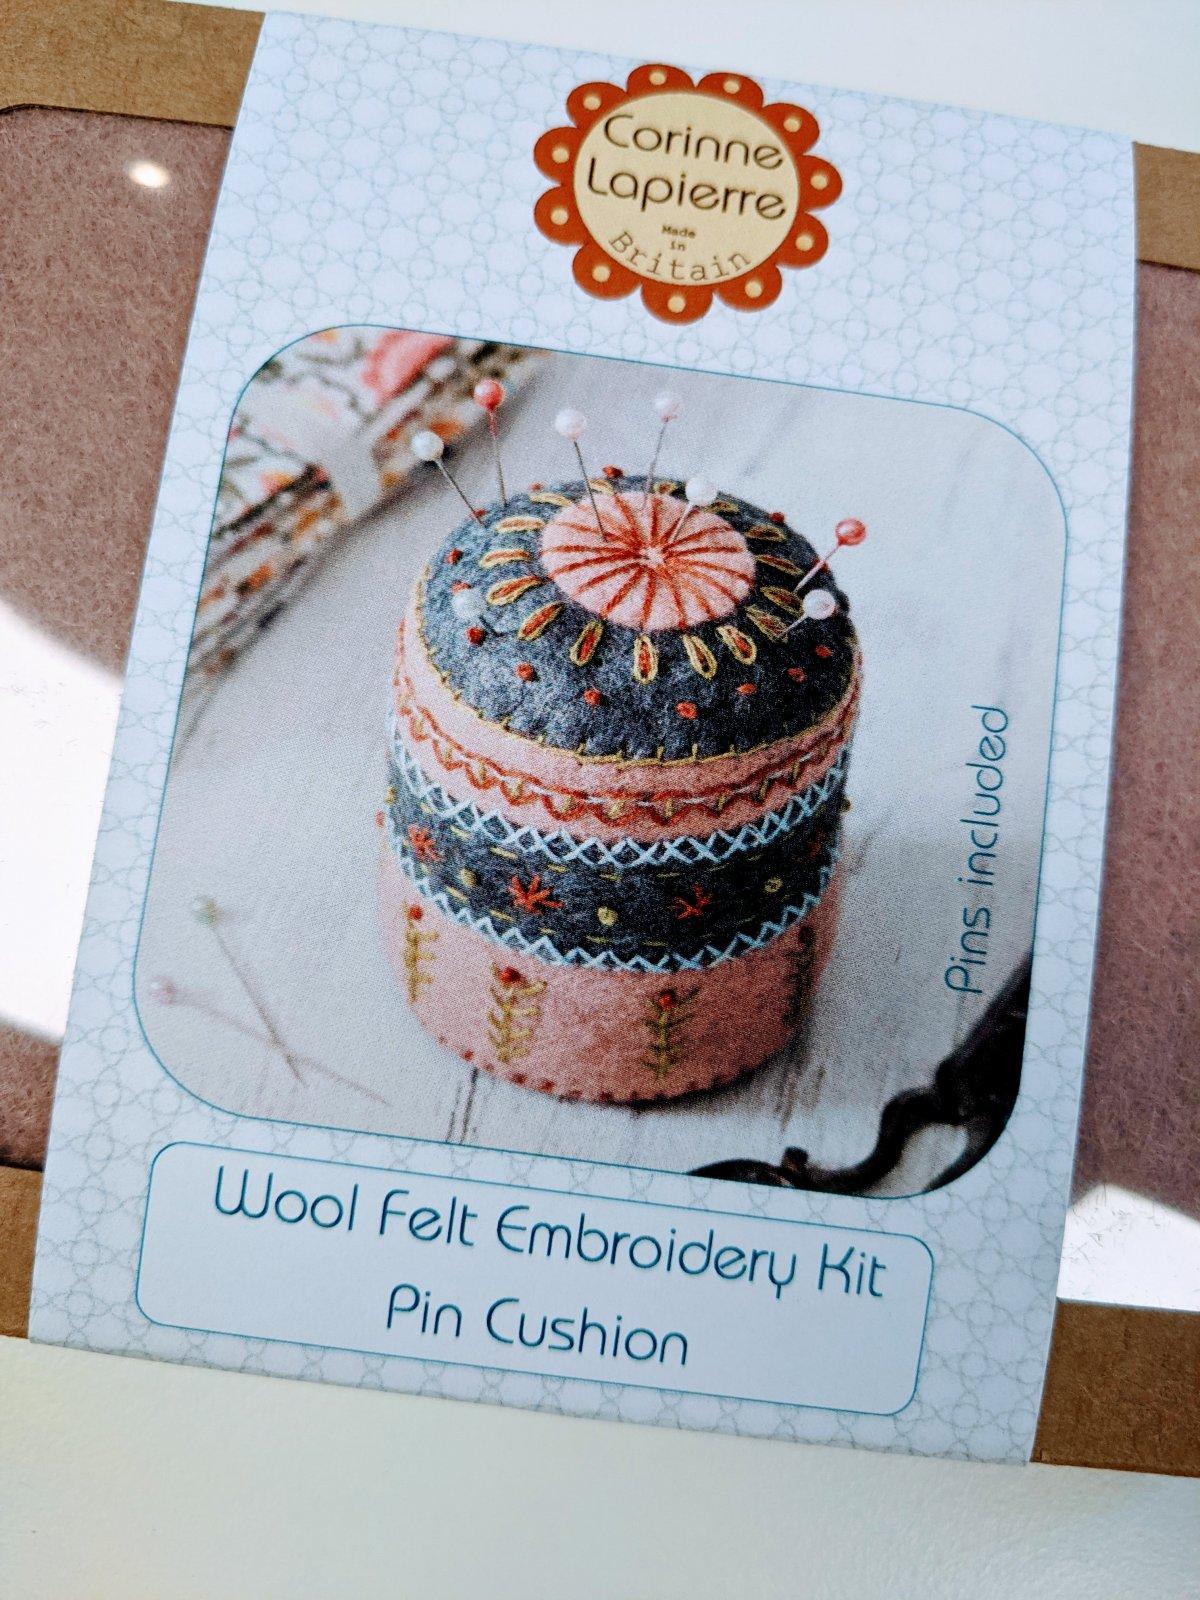 Pincushion Felt Kit by Corinne Lapierre